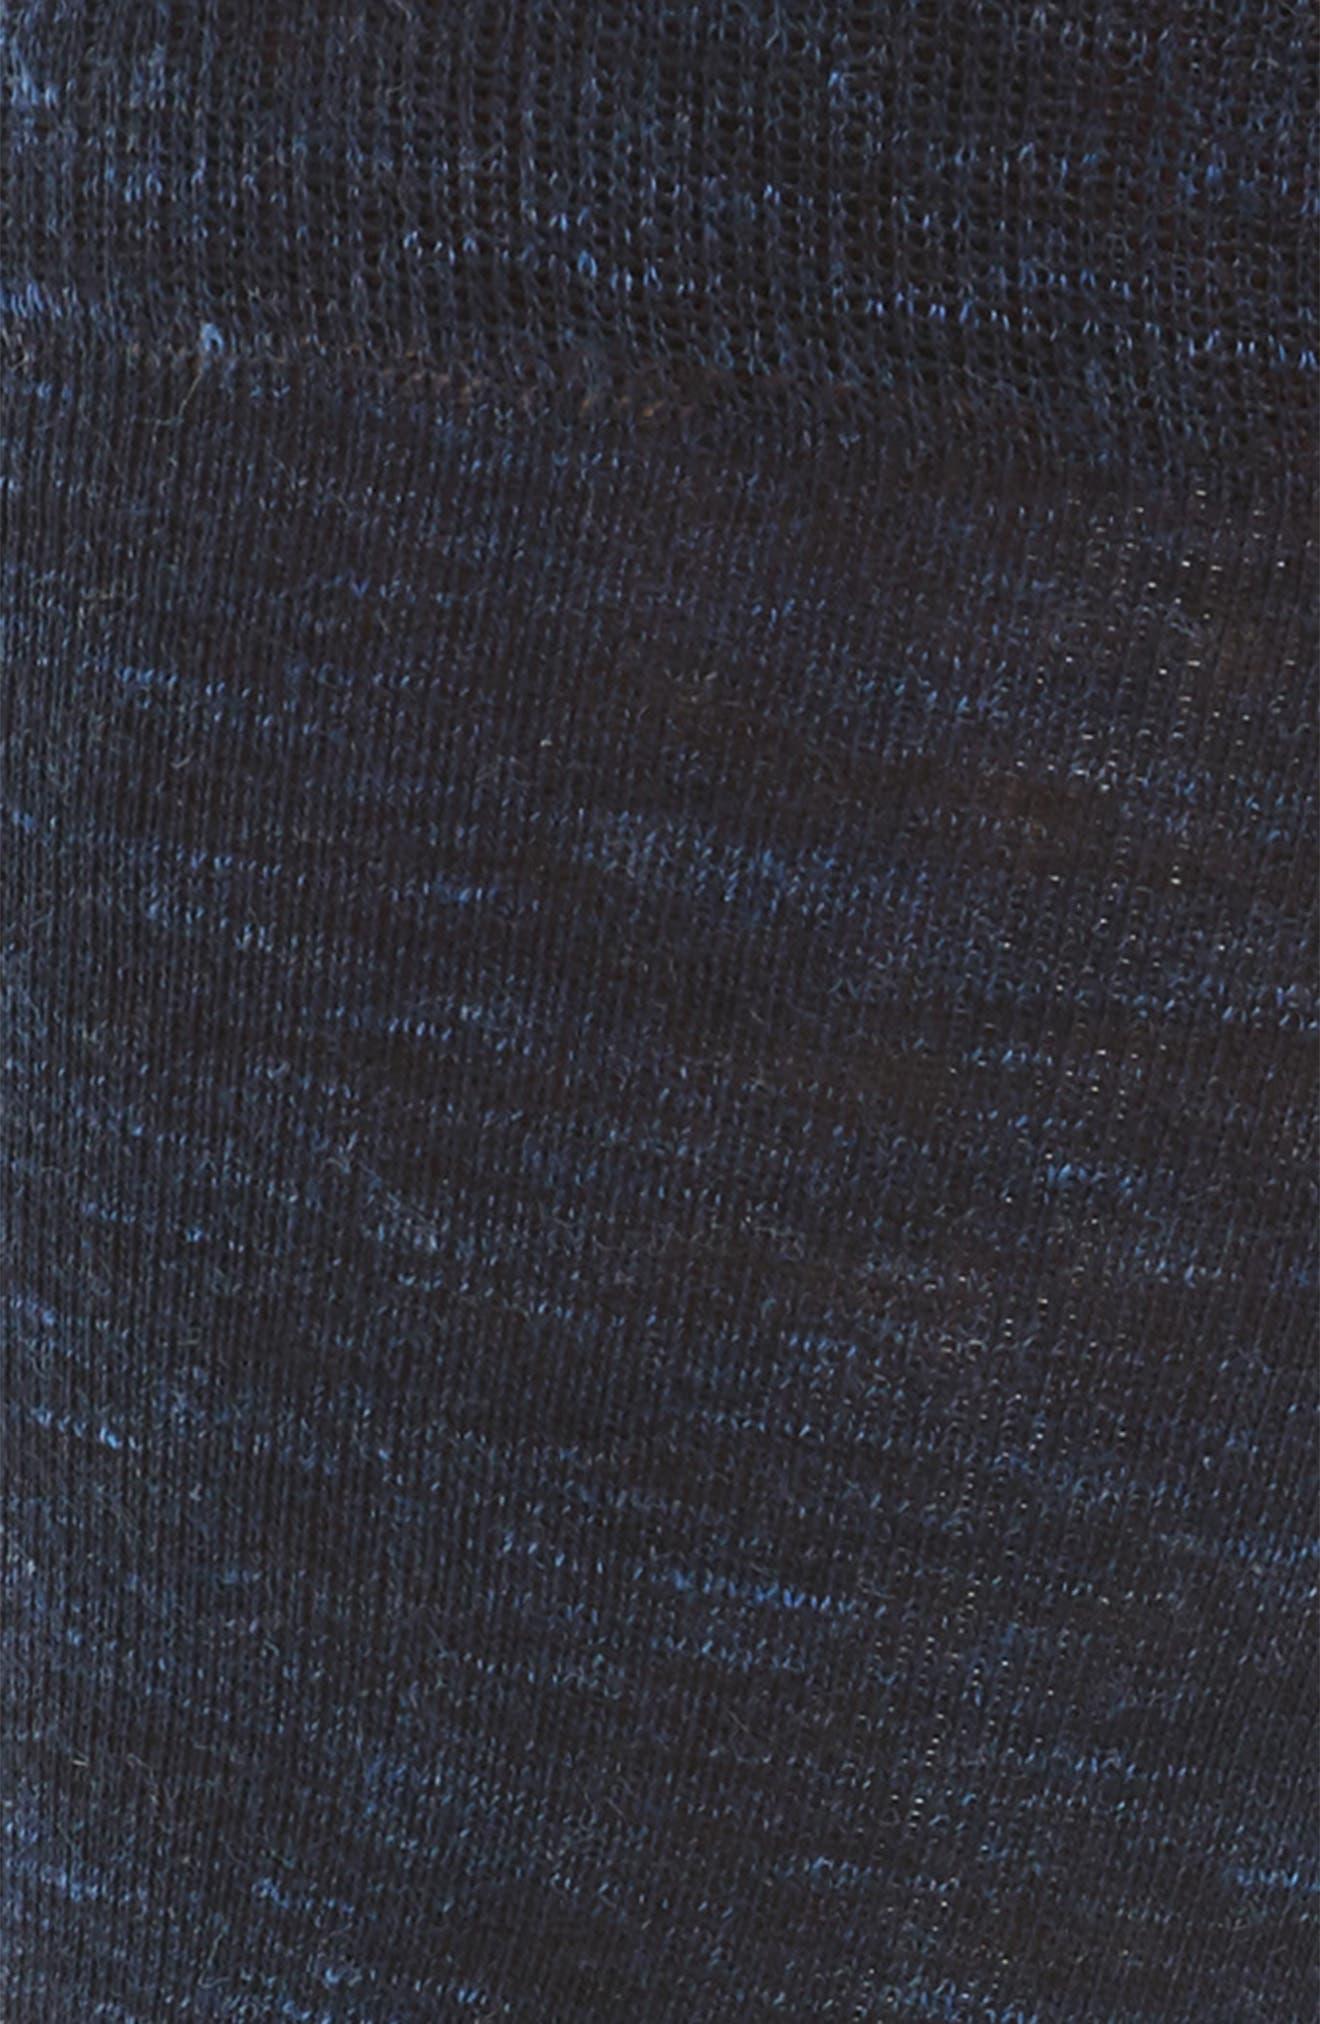 Twist Socks,                             Alternate thumbnail 2, color,                             Navy